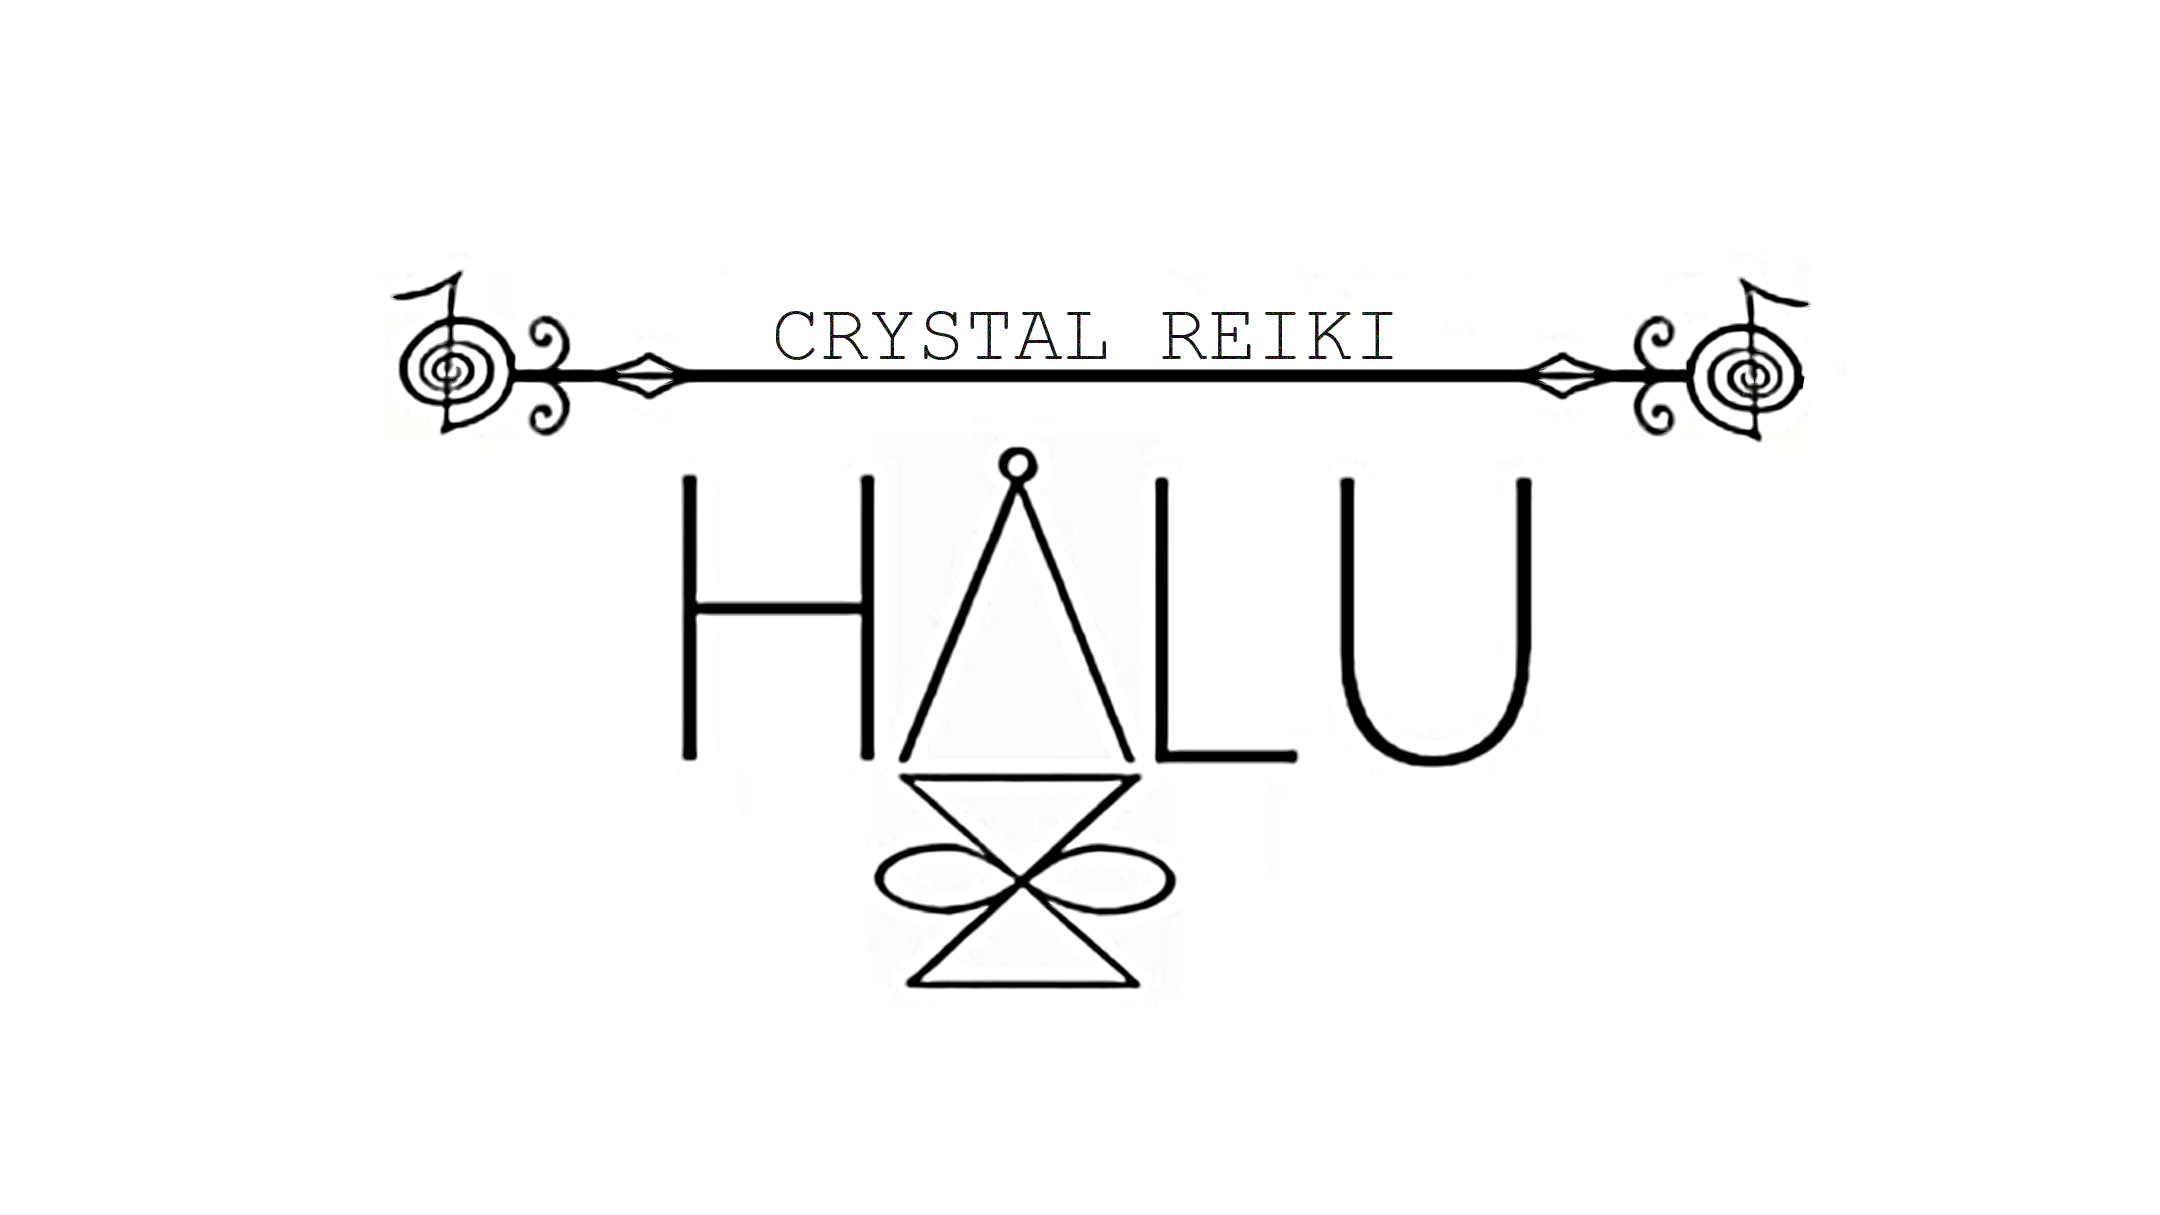 Halu Crystal Reiki